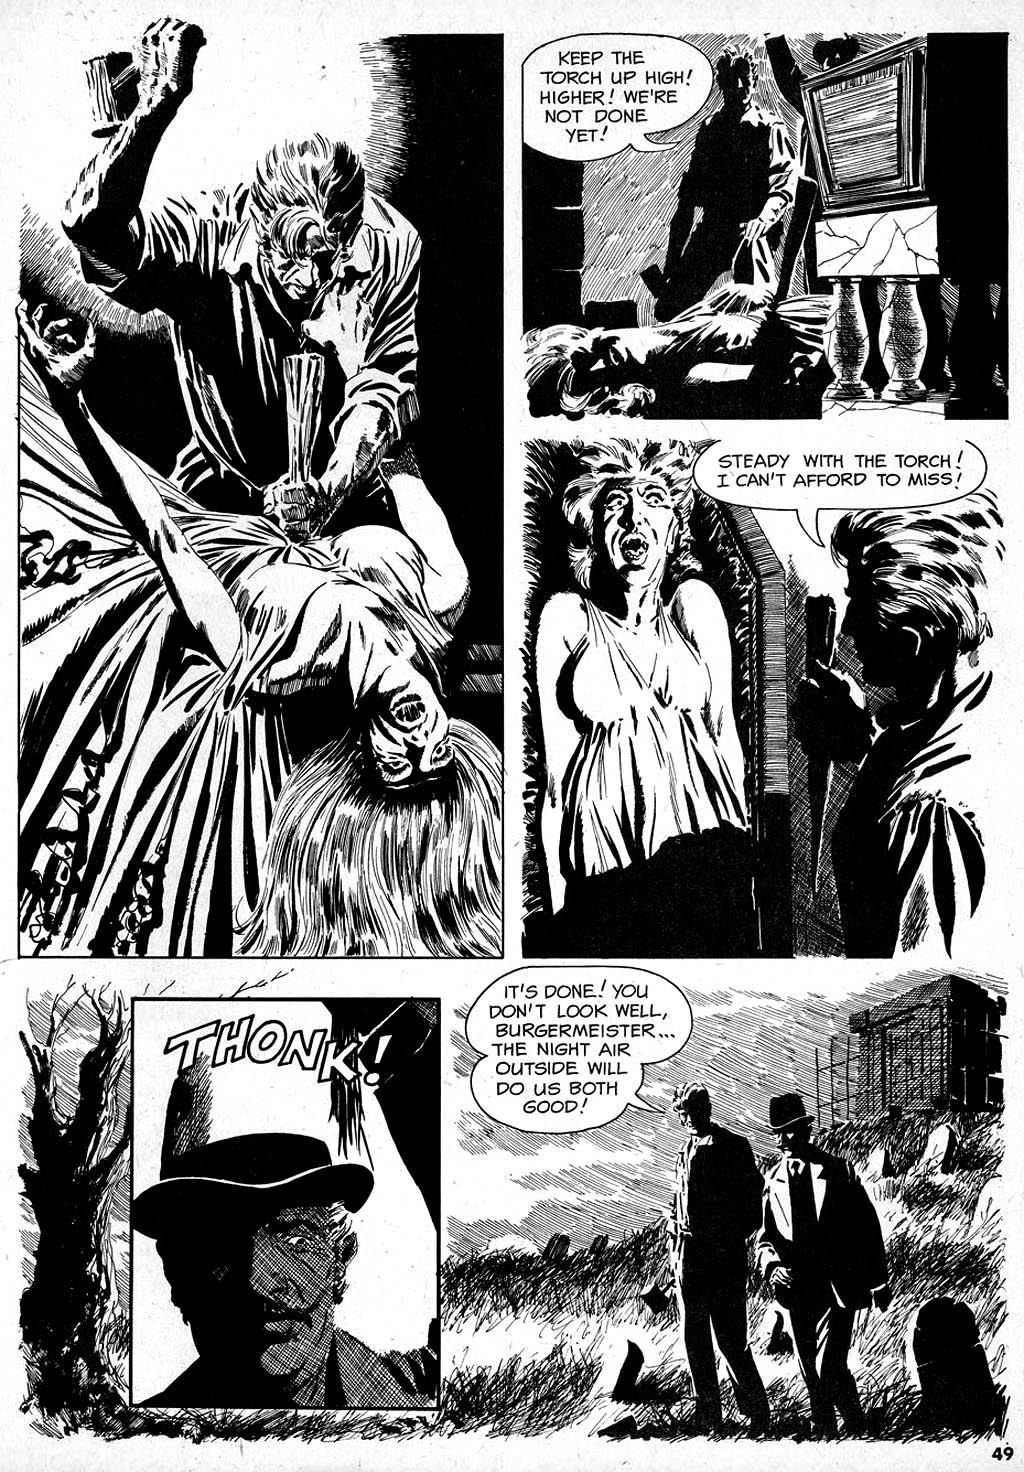 Creepy (1964) #1 pg47, art by Angelo Torres.